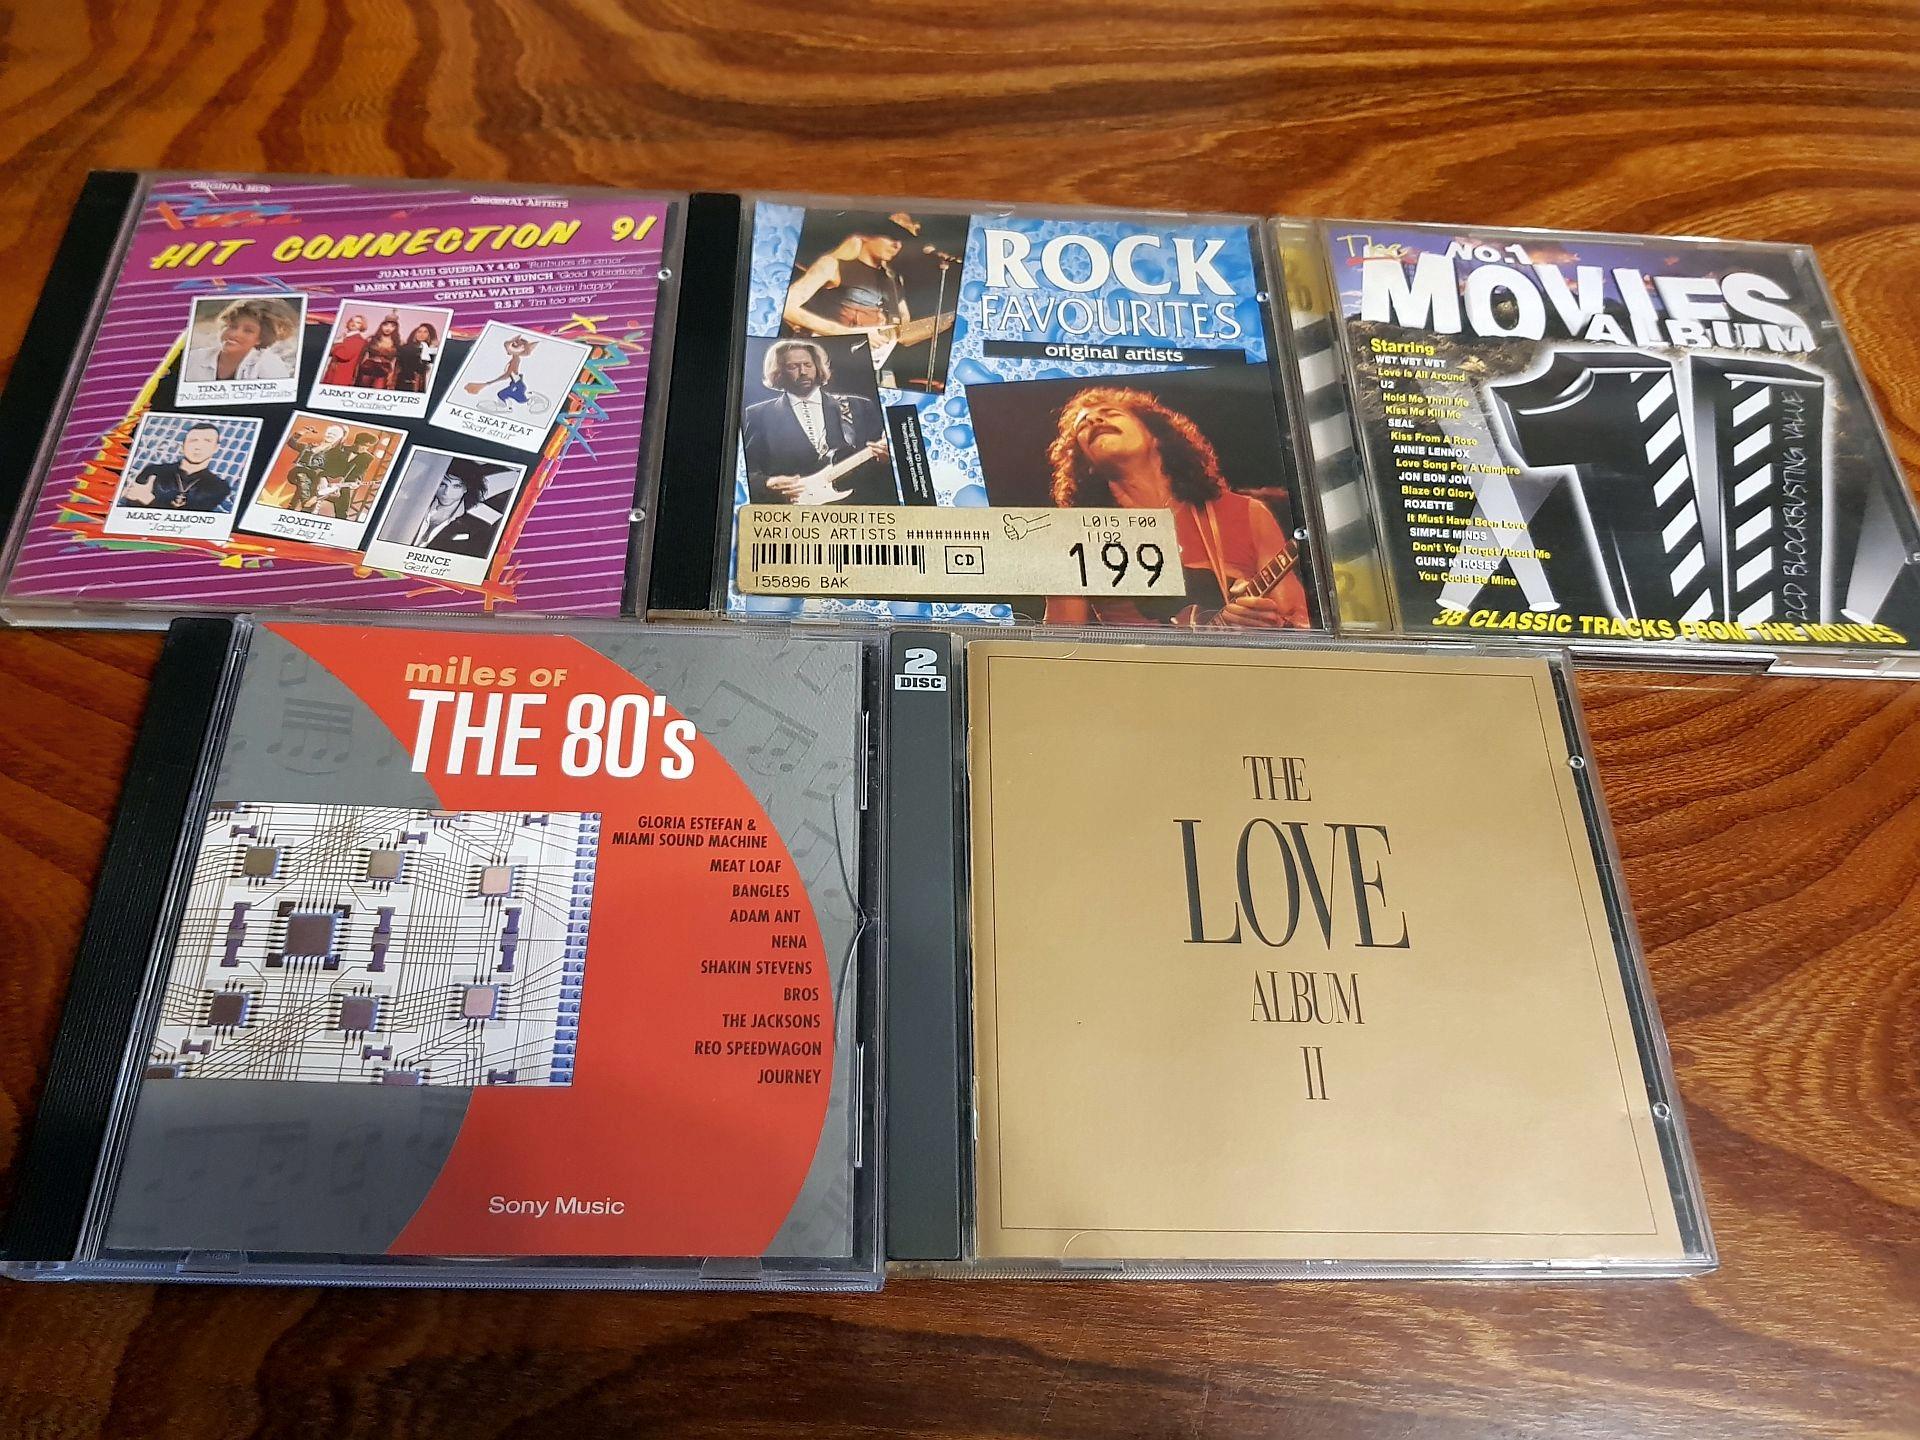 ZESTAW 7CD / THE 80',LOVE ALBUM,HIT CONNECTION 91